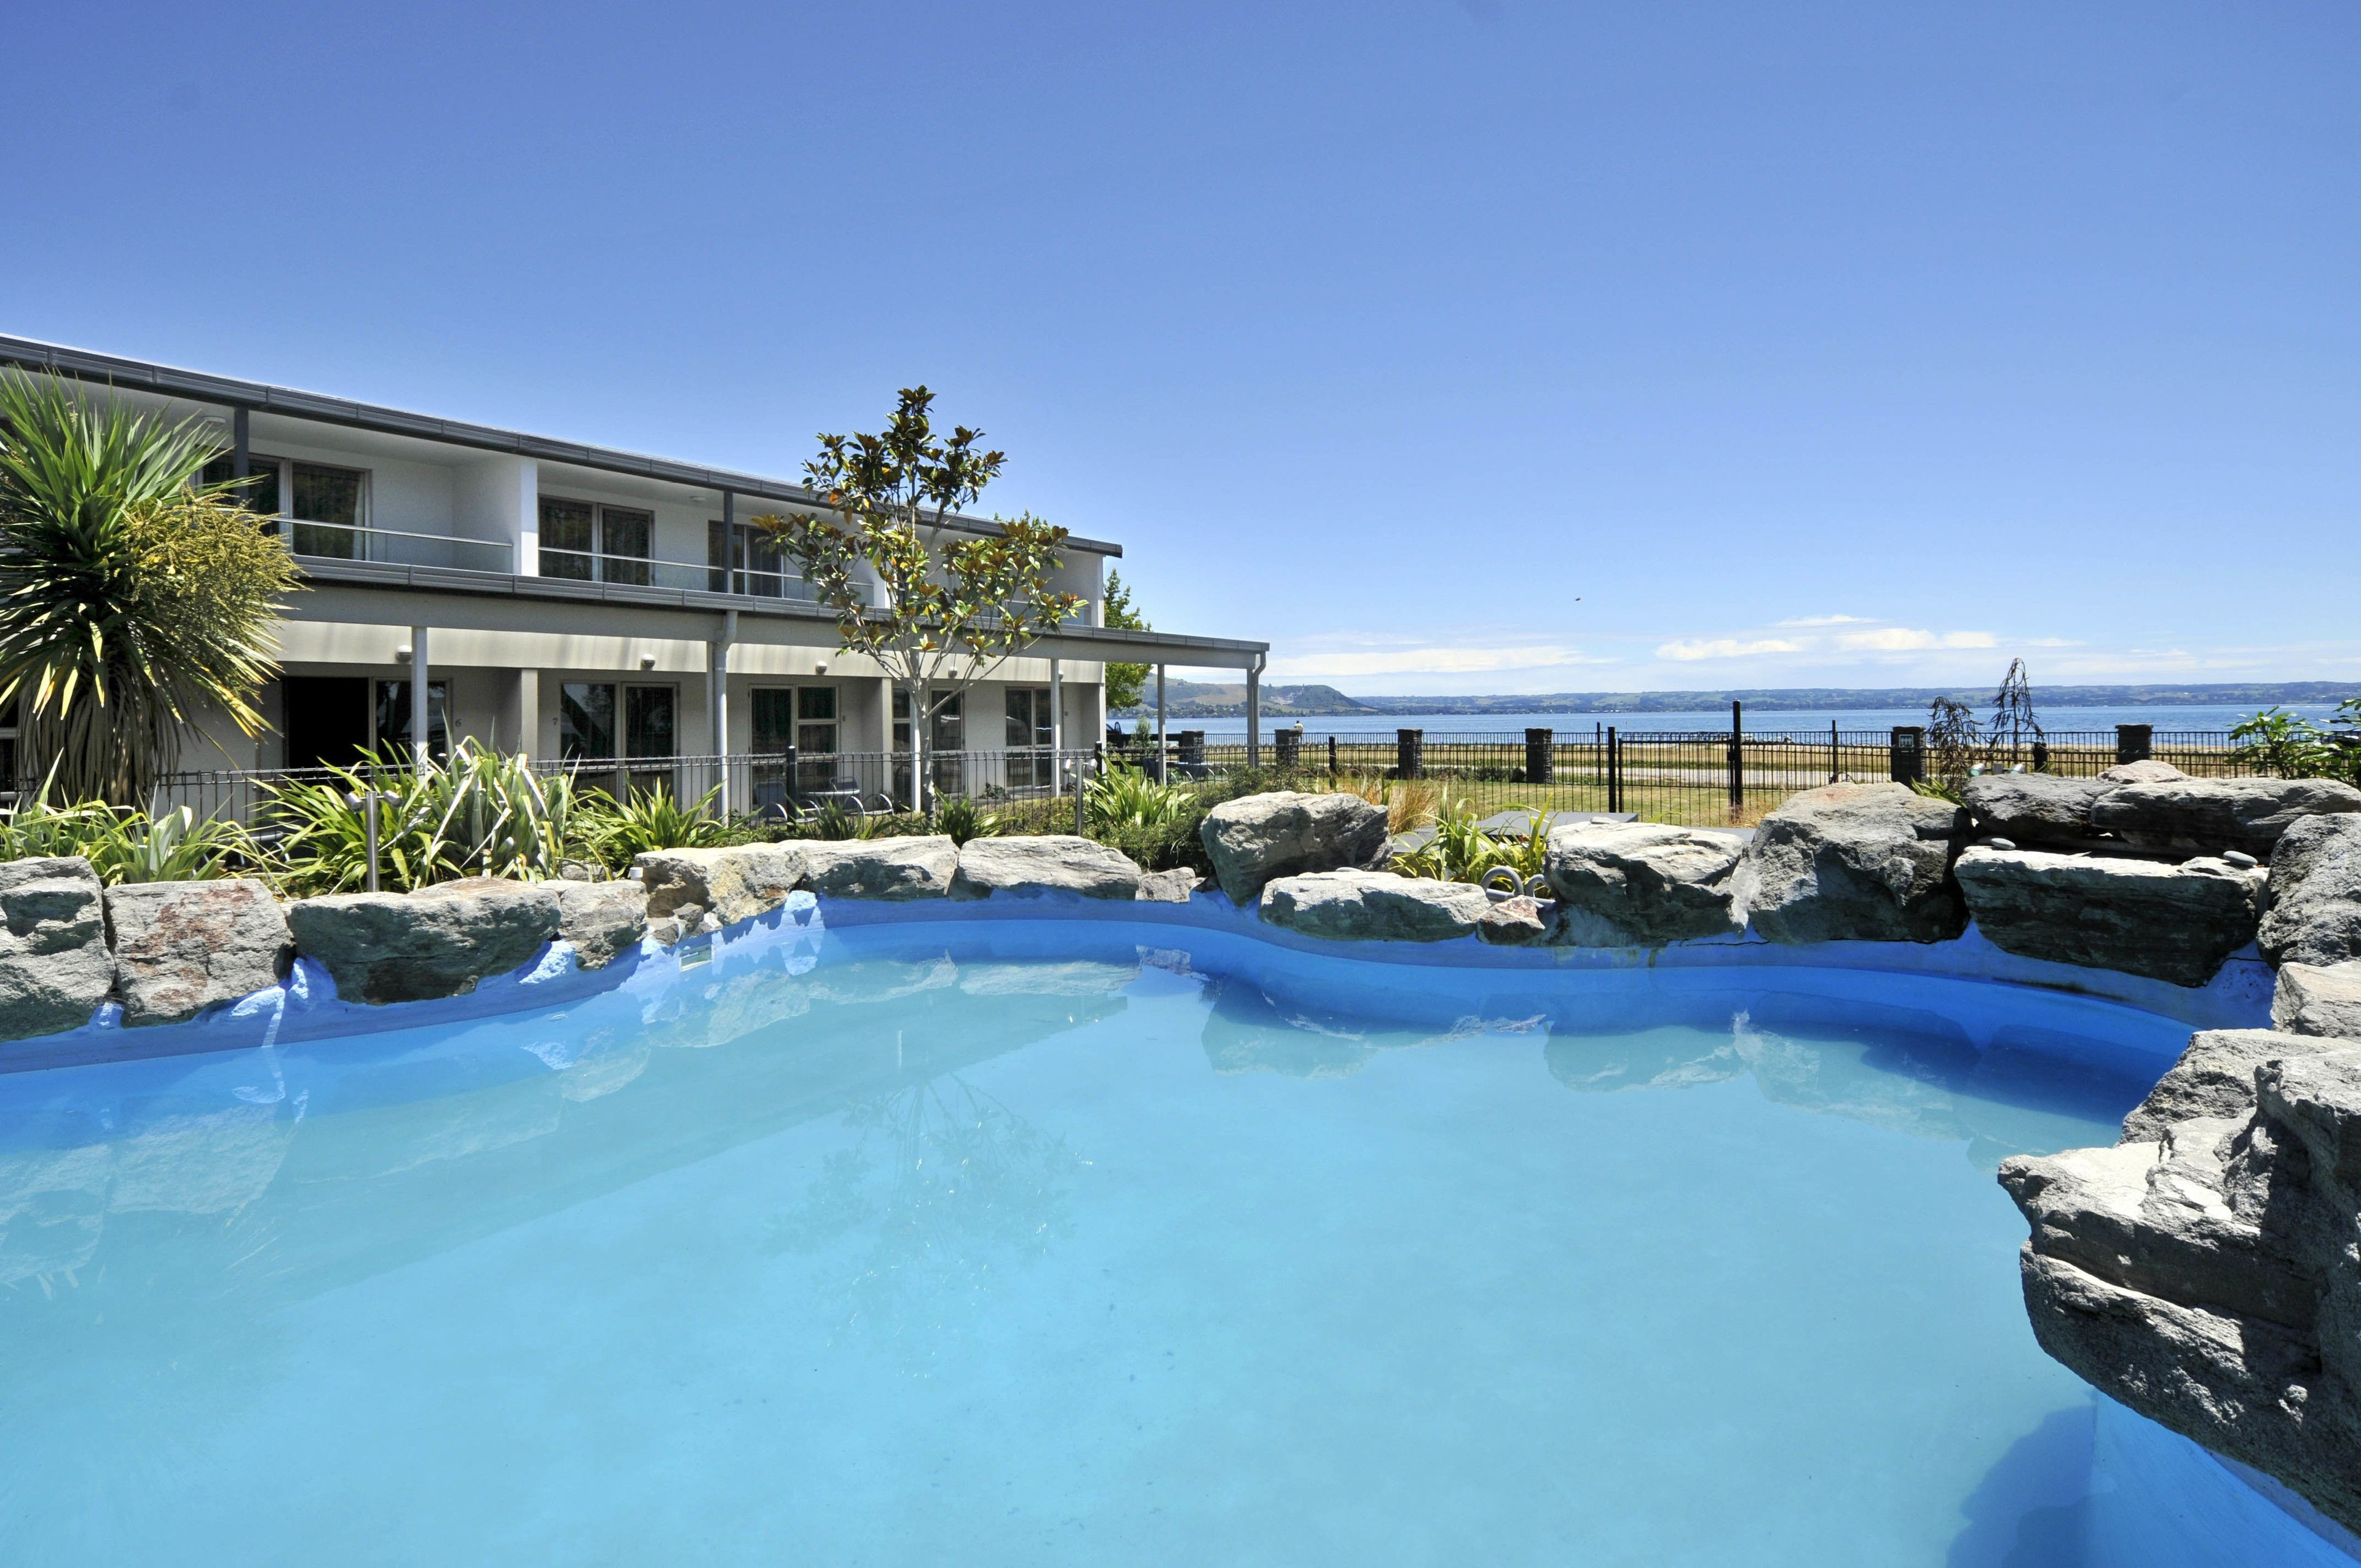 Courtesy of Wai Ora Lakeside Spa Resort / Expedia